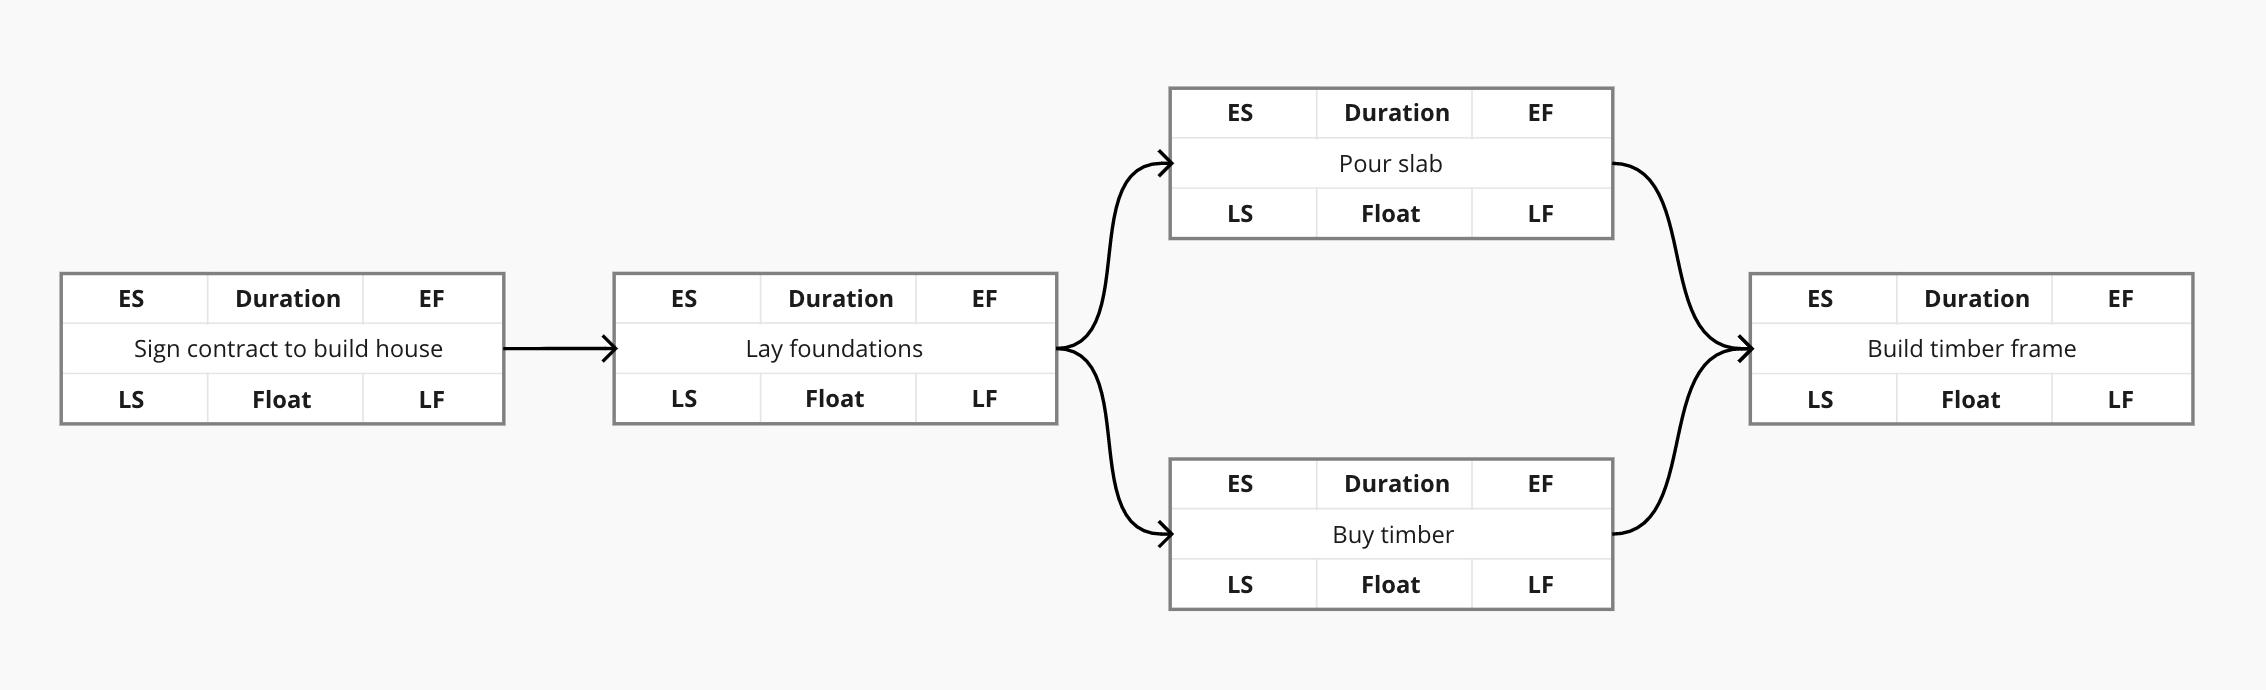 Critical path method step 3: Map tasks